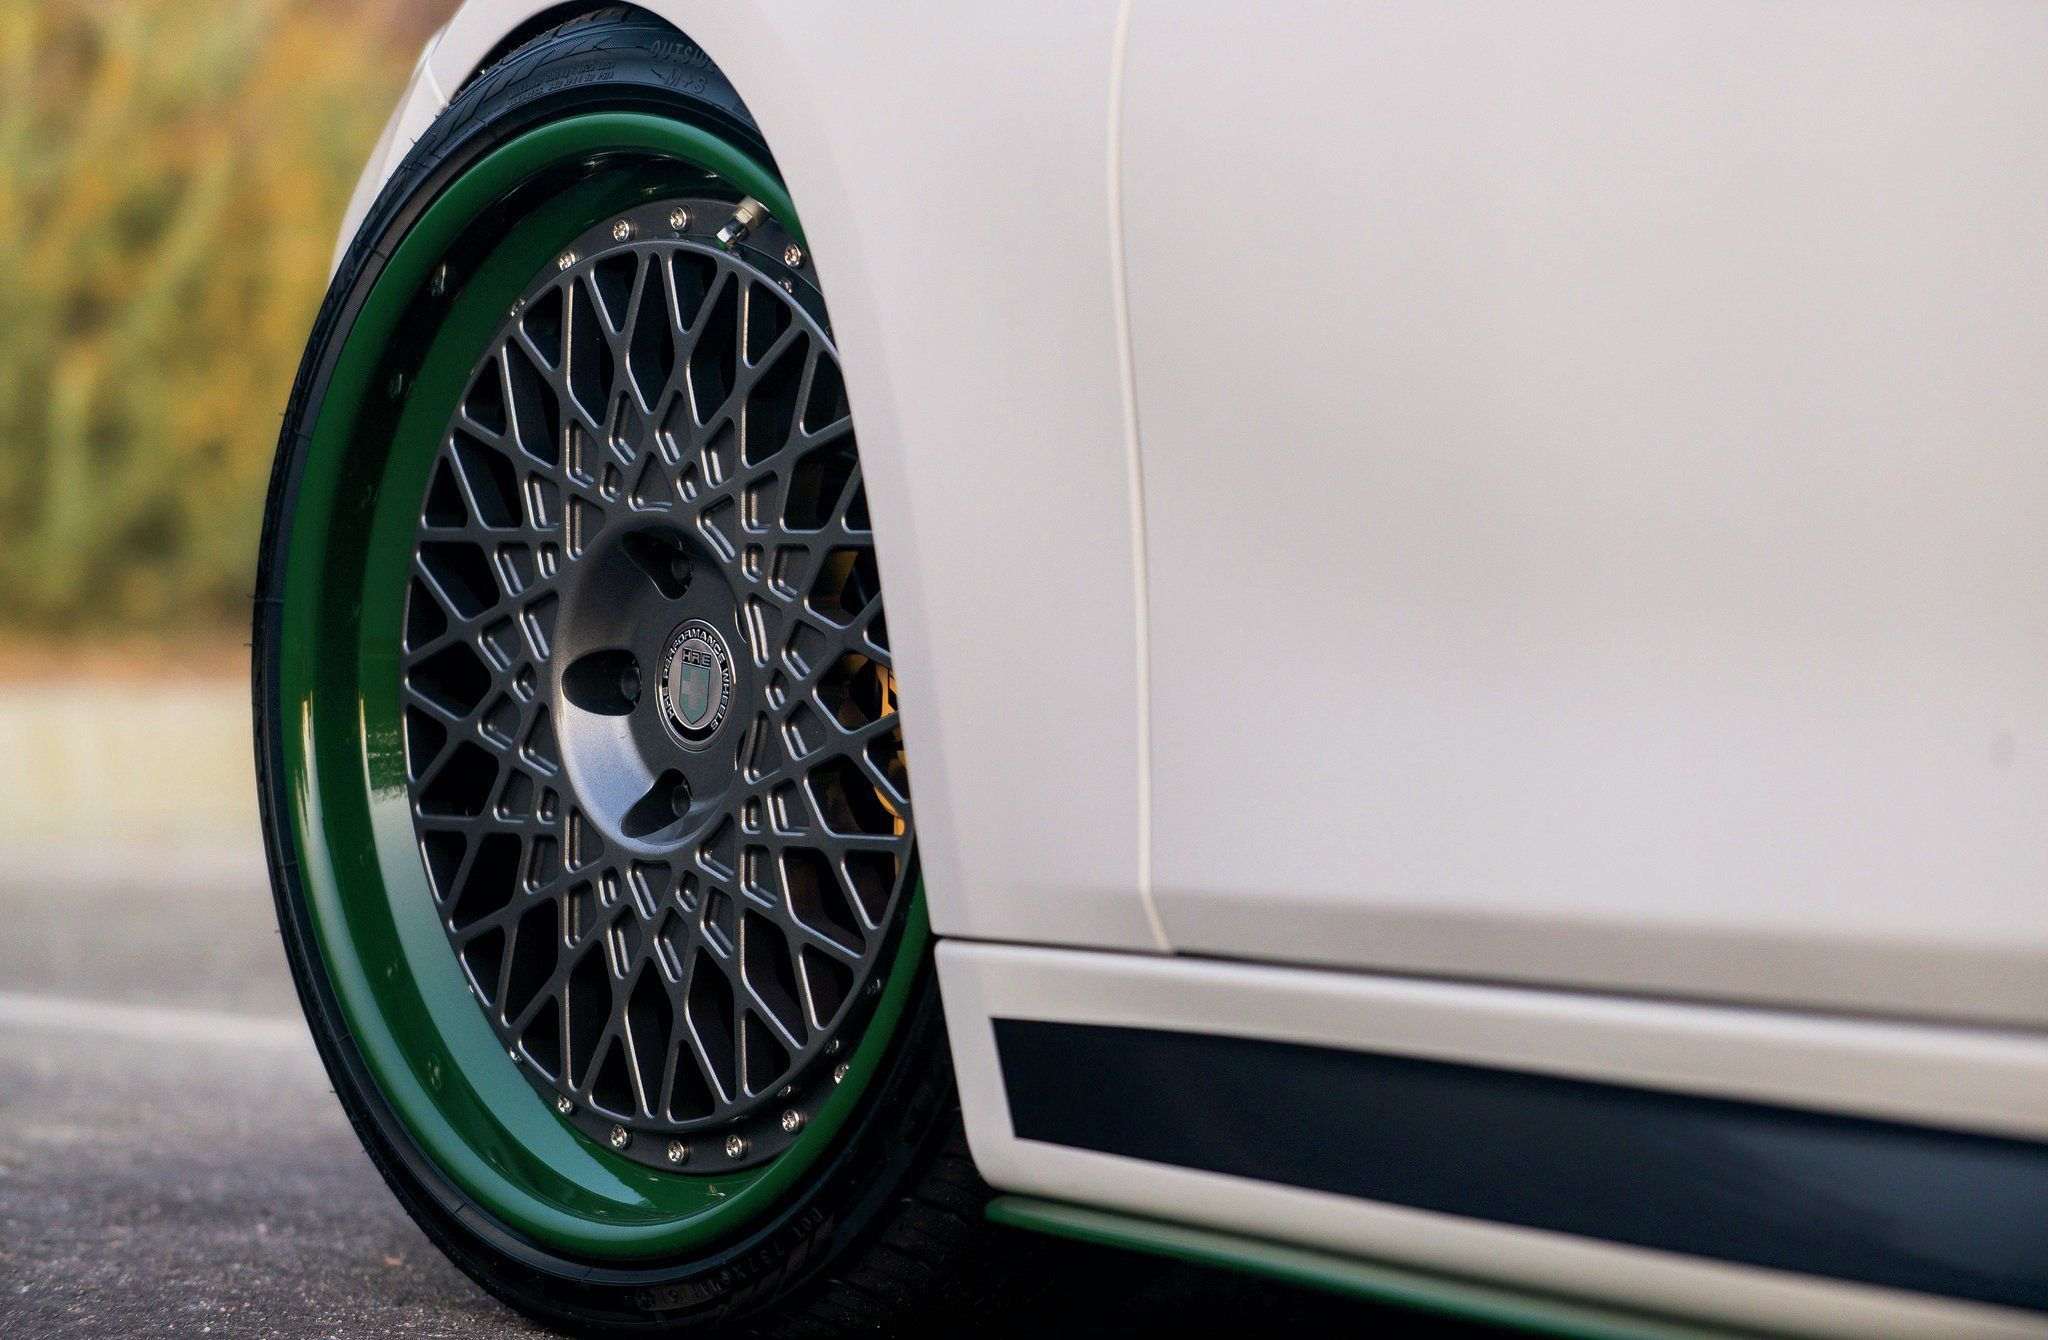 2014 BMW 328i xDrive HRE 501 vintage series wheel 06 2 048—1 340